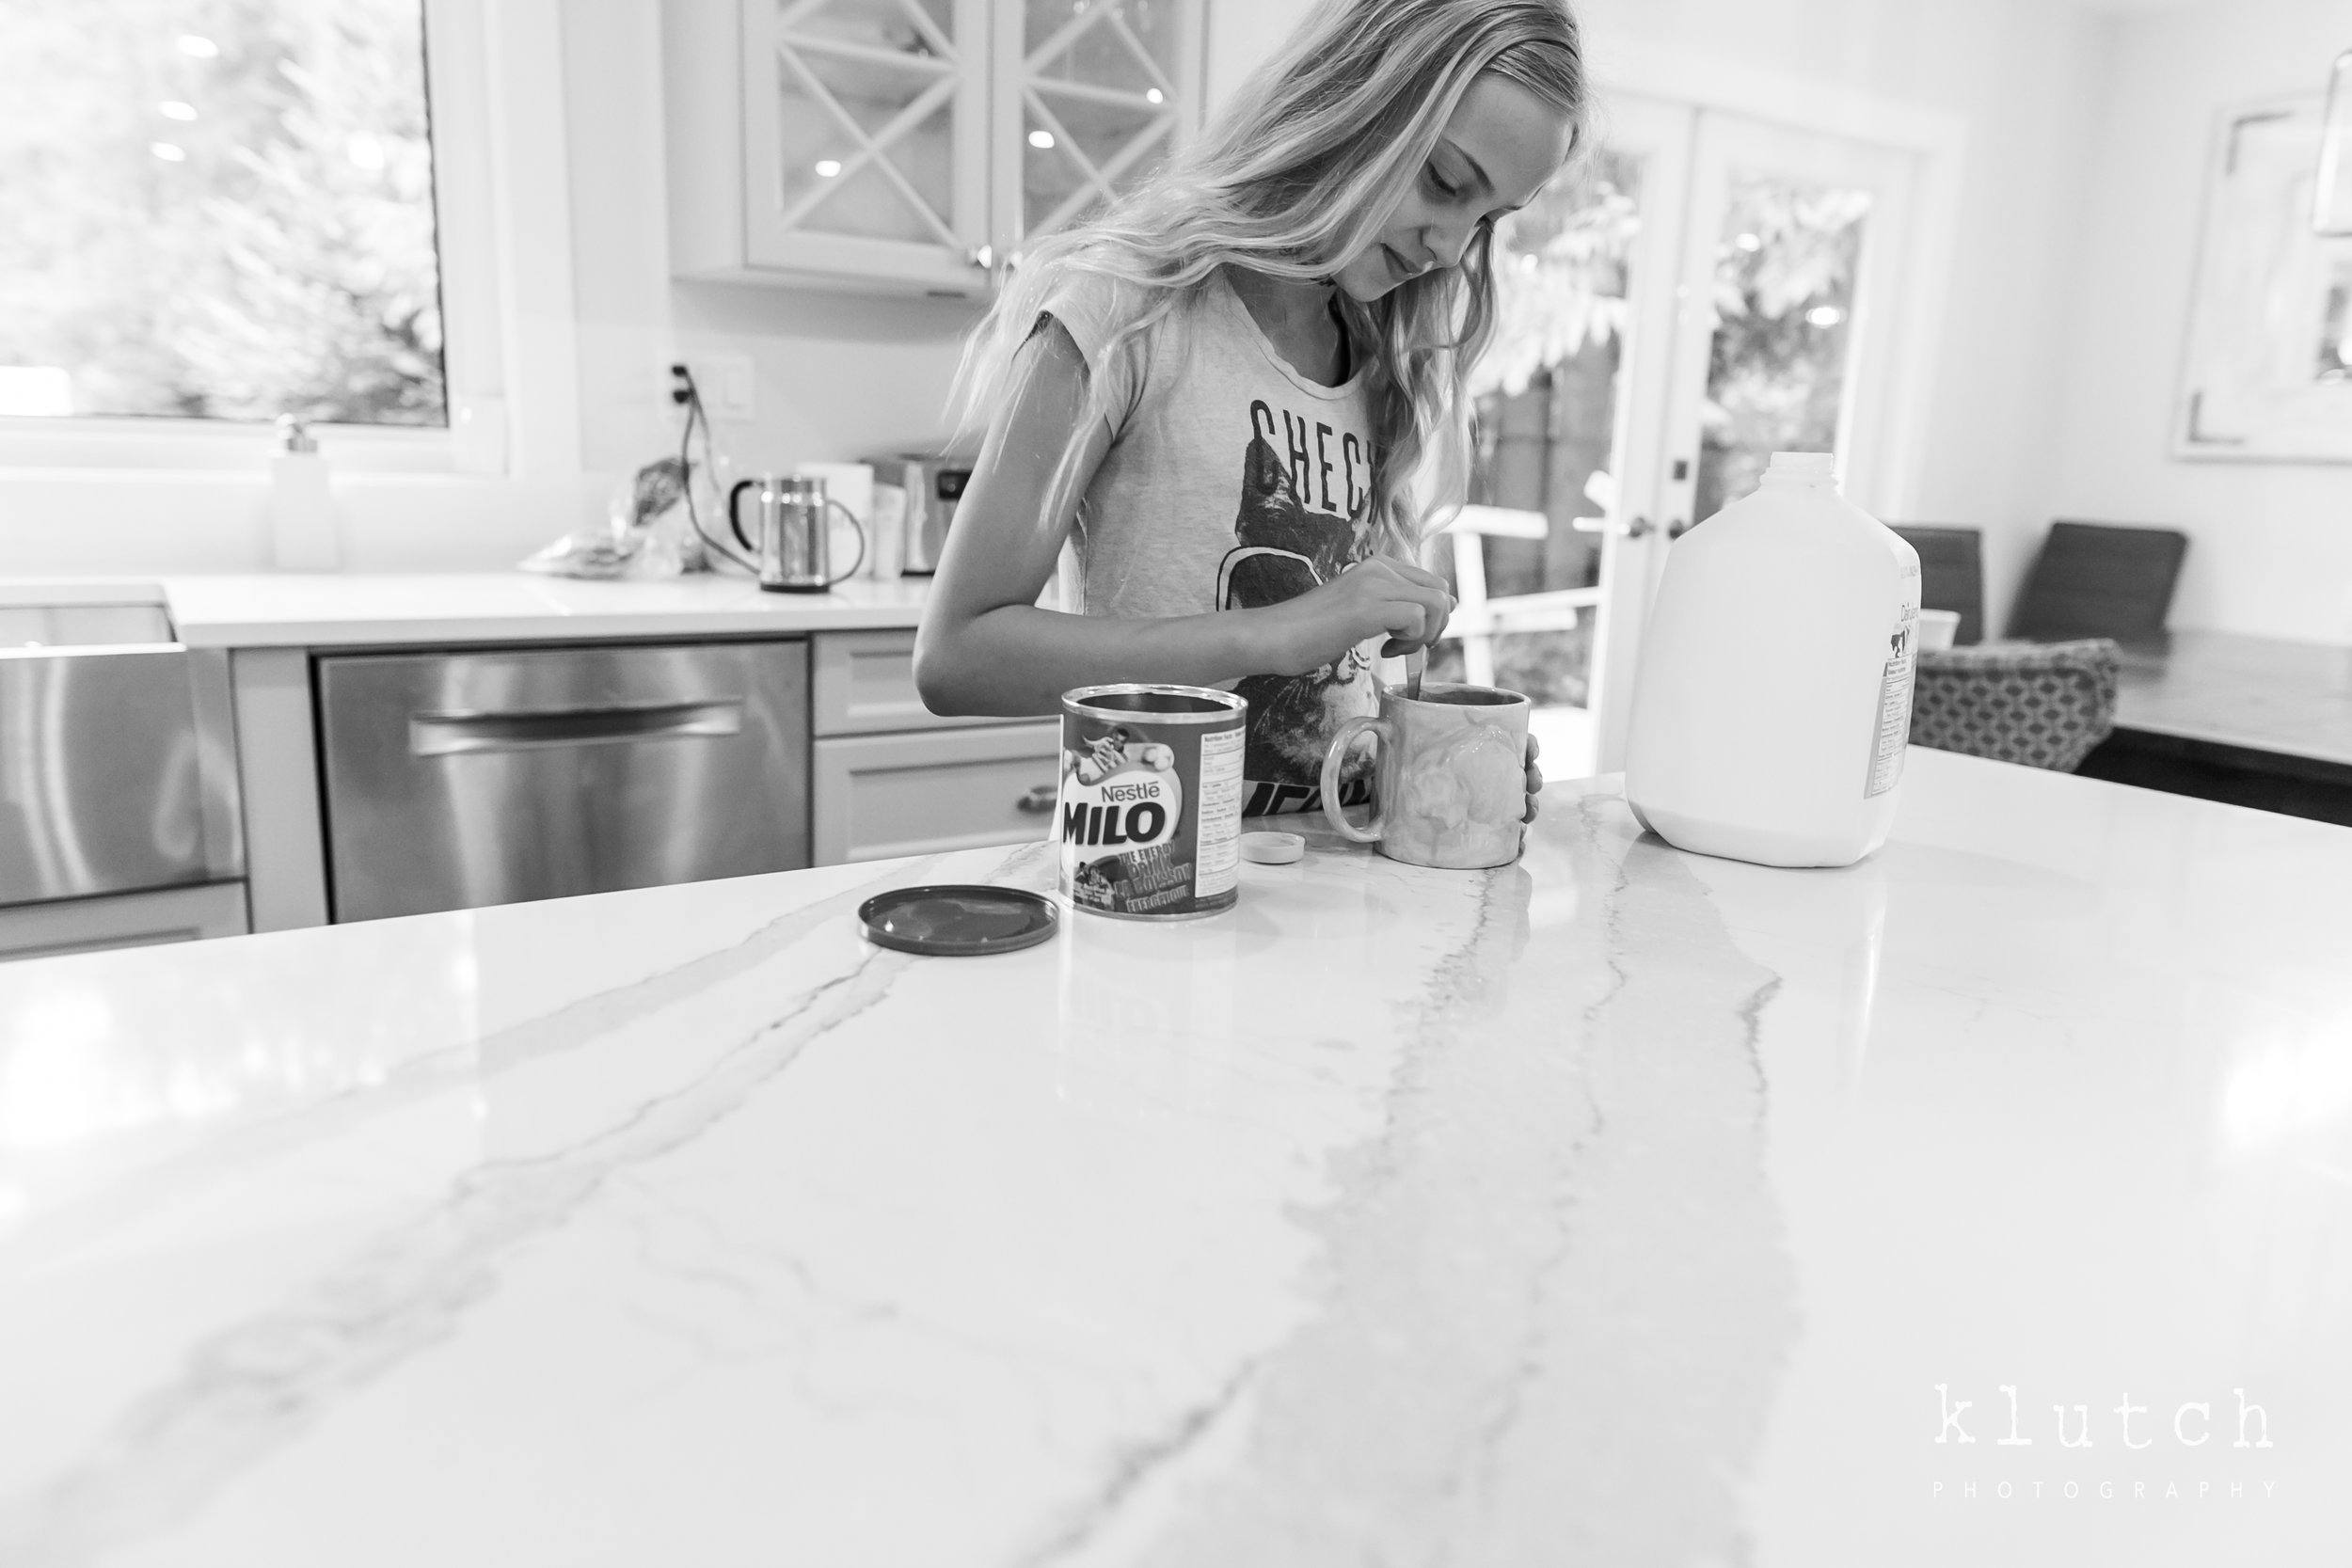 Surrey Family Photographer. Vancouver family photographer, klutch Photography, documentary photography, Vancouver documentary photographer, candid photography, lifestyle photographer, a day in the life session, family photography, Vancouver Photographer, Surrey Family Photographer, White Rock family Photographer, Dina Ferreira Stoddard, girl making chocolate milk-9838.jpg